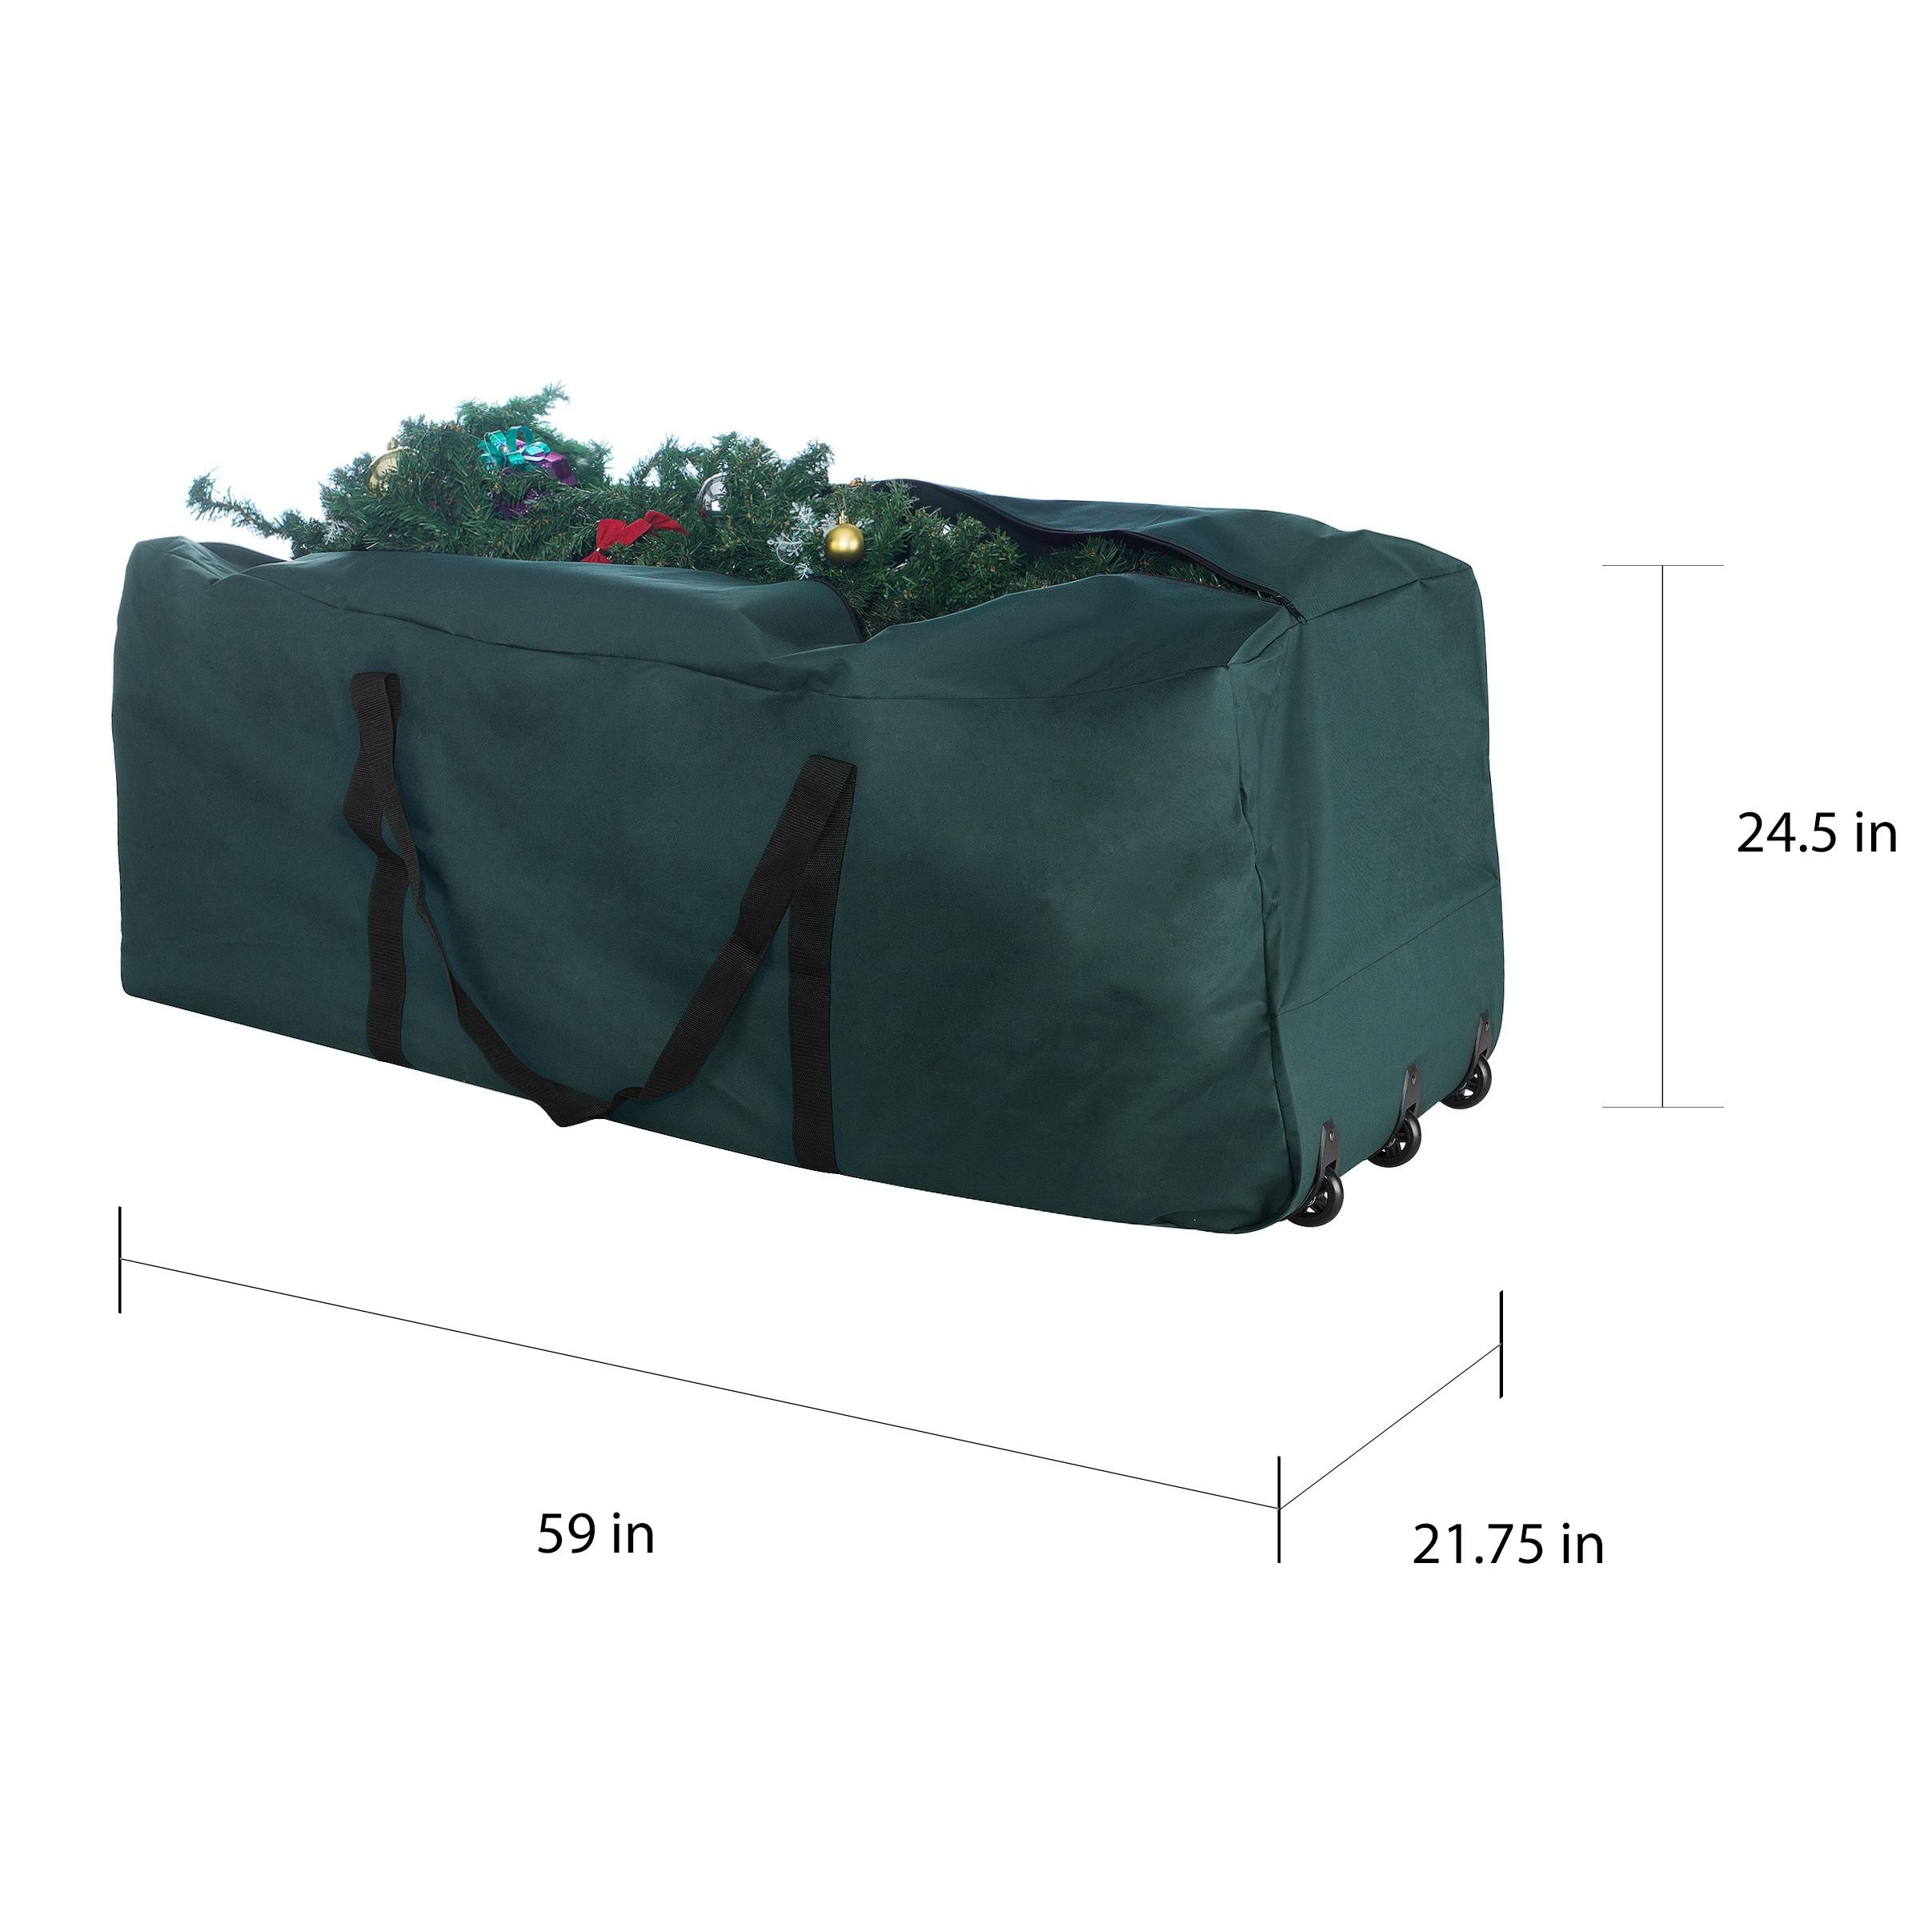 Shop Elf Stor Green Canvas Rolling Christmas Tree Storage Duffel Bag ... 11a094b95bf2a